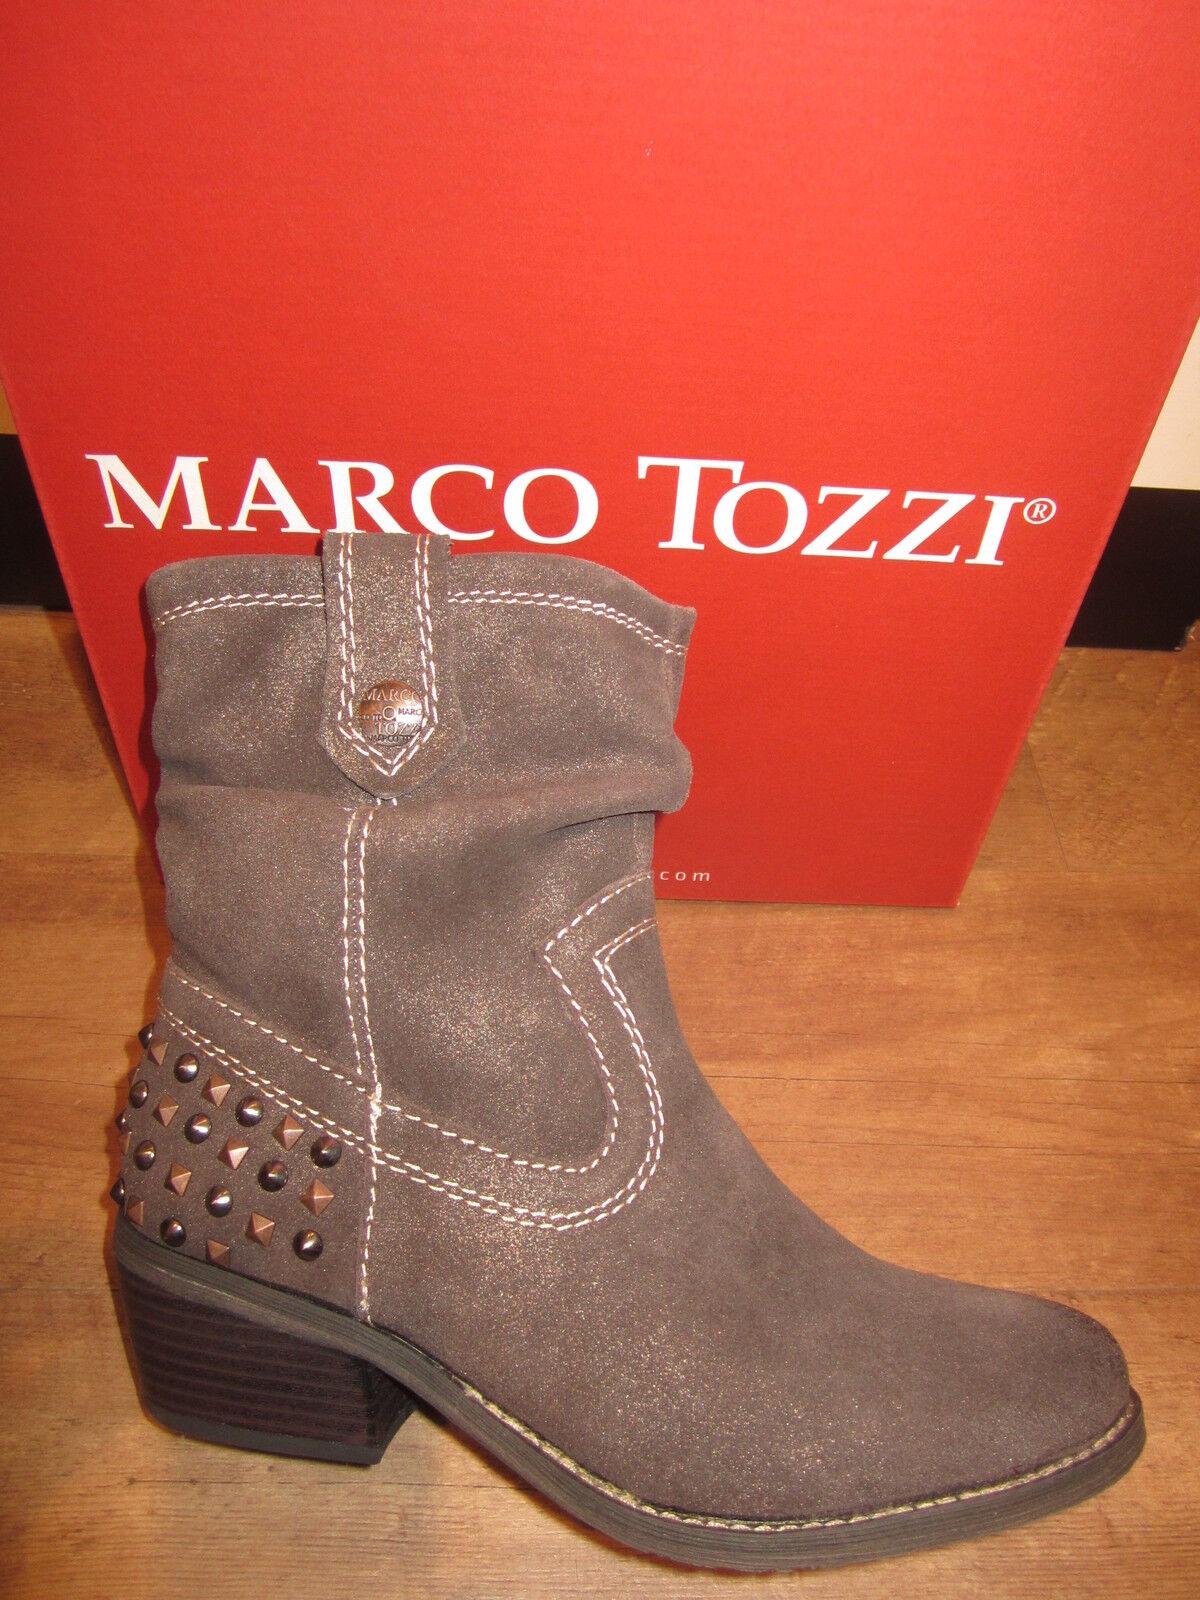 outlet store b72e4 1e9b9 Marco Tozzi Stiefel Stiefelette Stiefeletten braun Leder leicht gefüttert  NEU!!